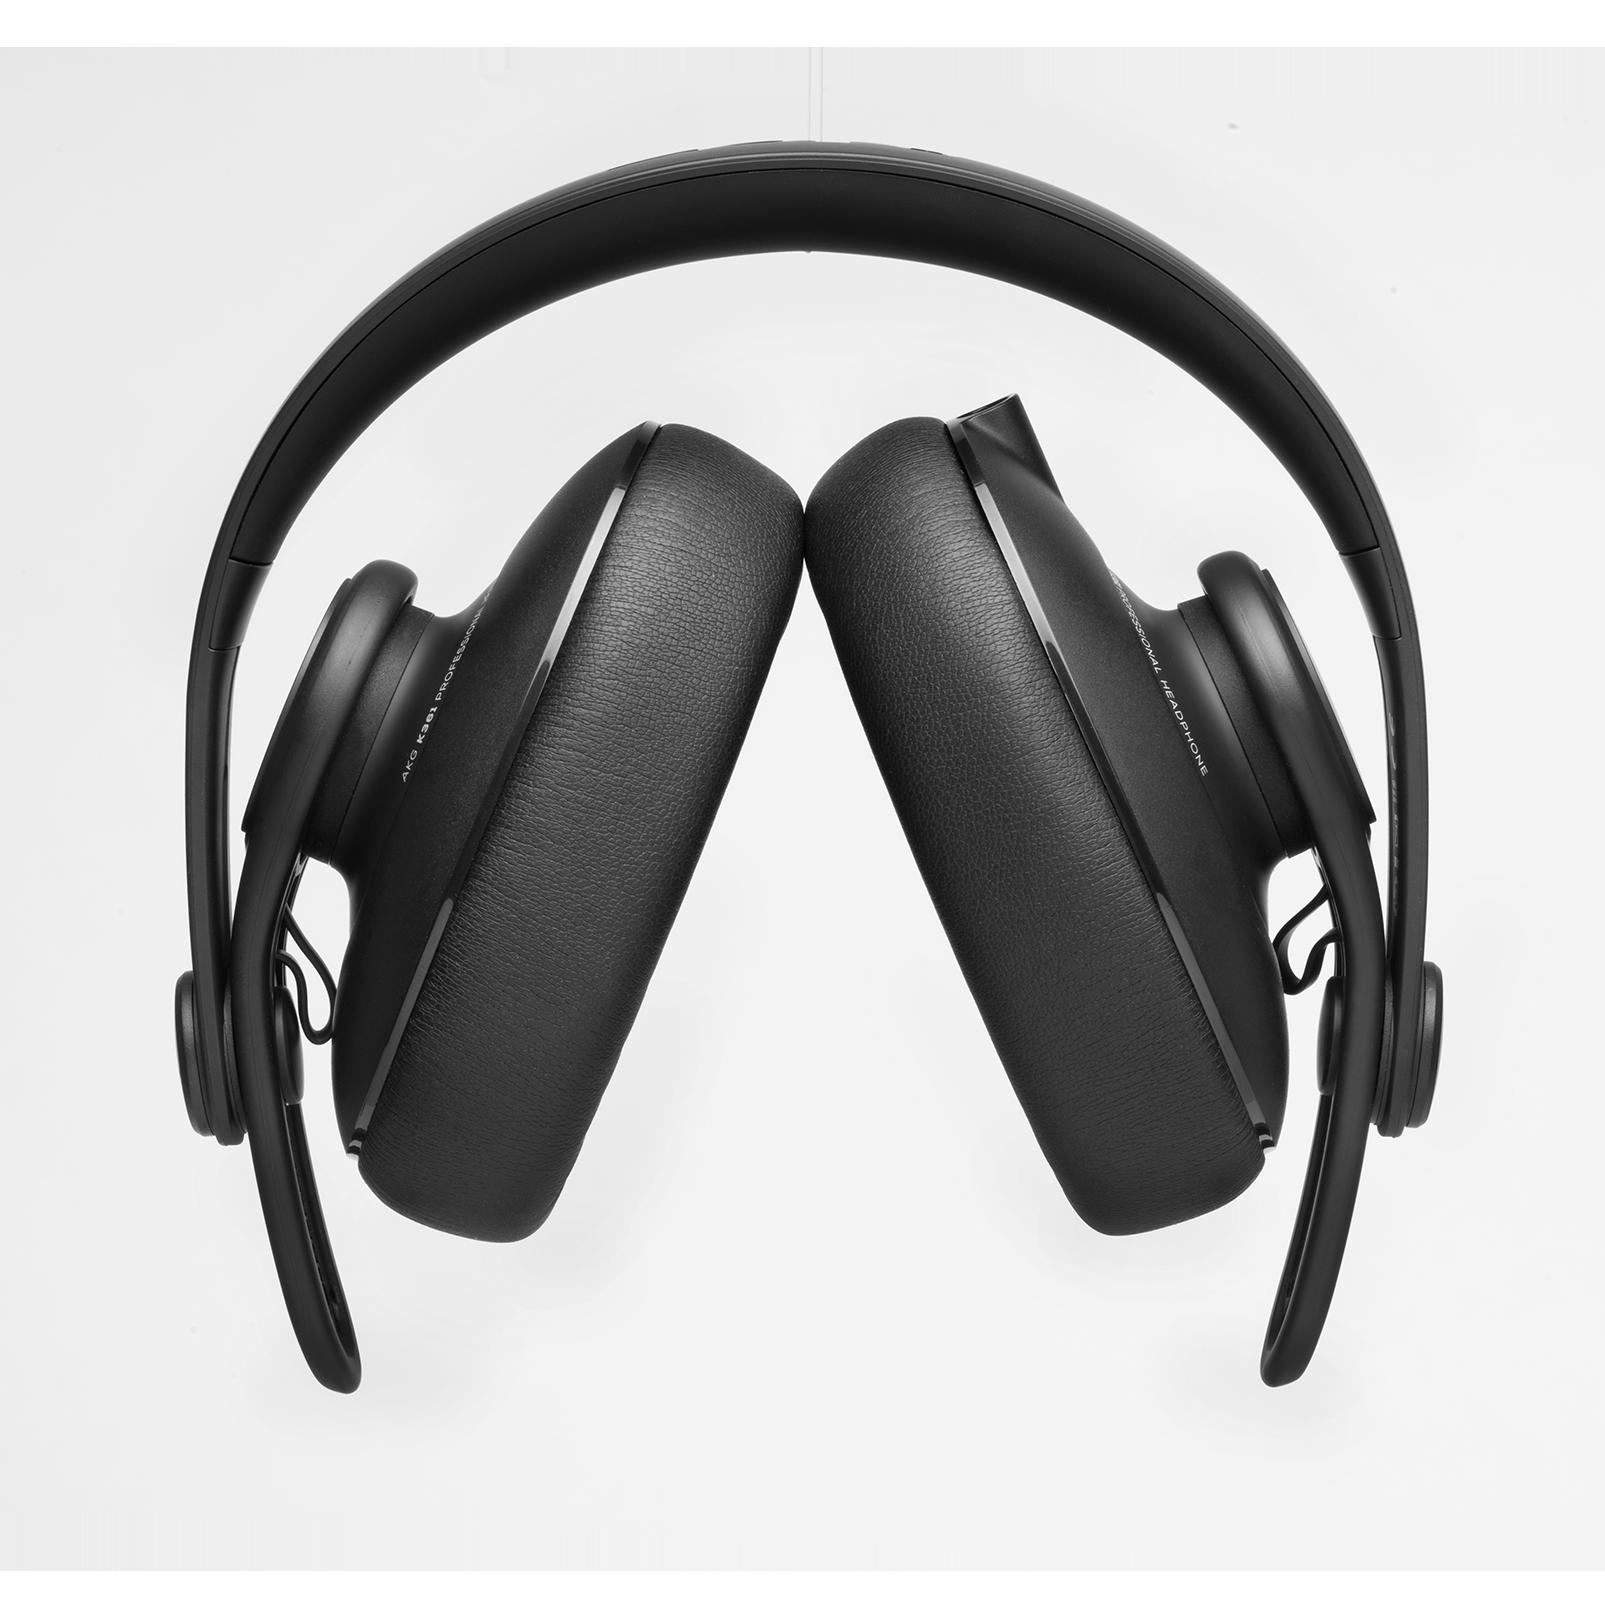 K361 - Black - Over-ear, closed-back, foldable studio headphones  - Detailshot 2